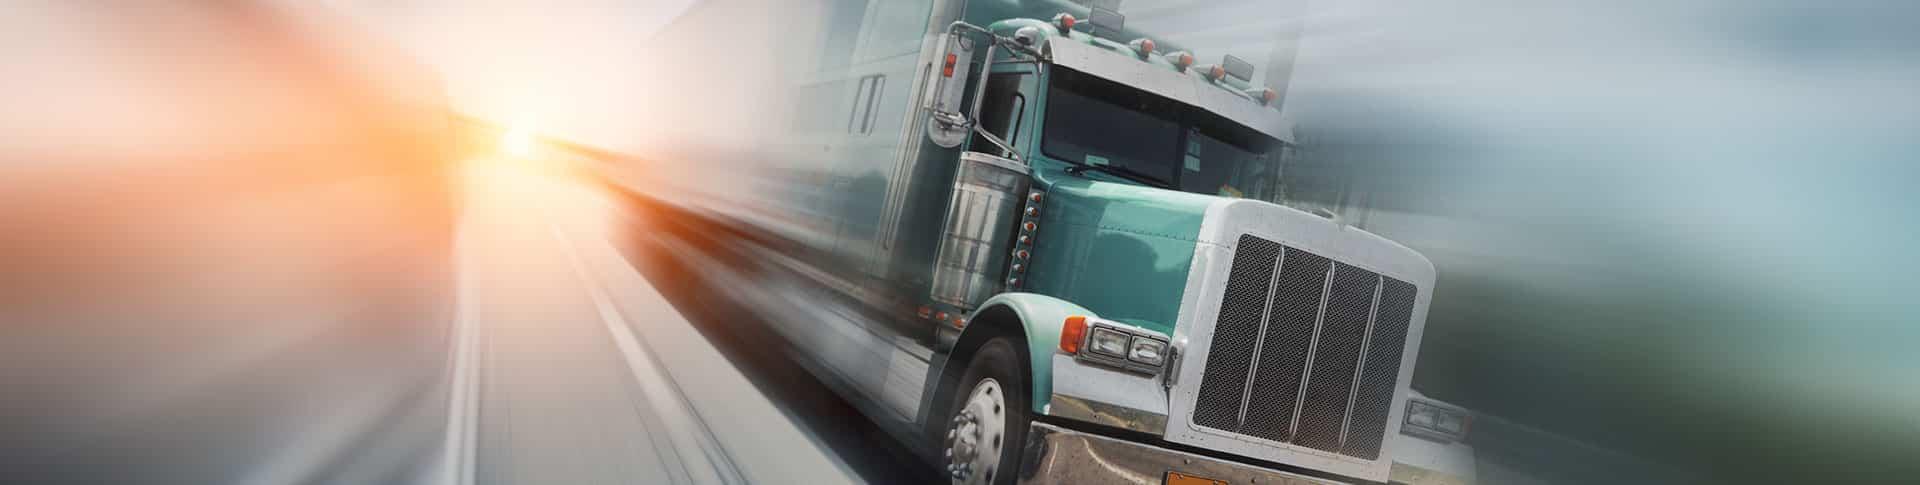 SOAP Camiones | SEGUROSERVICE